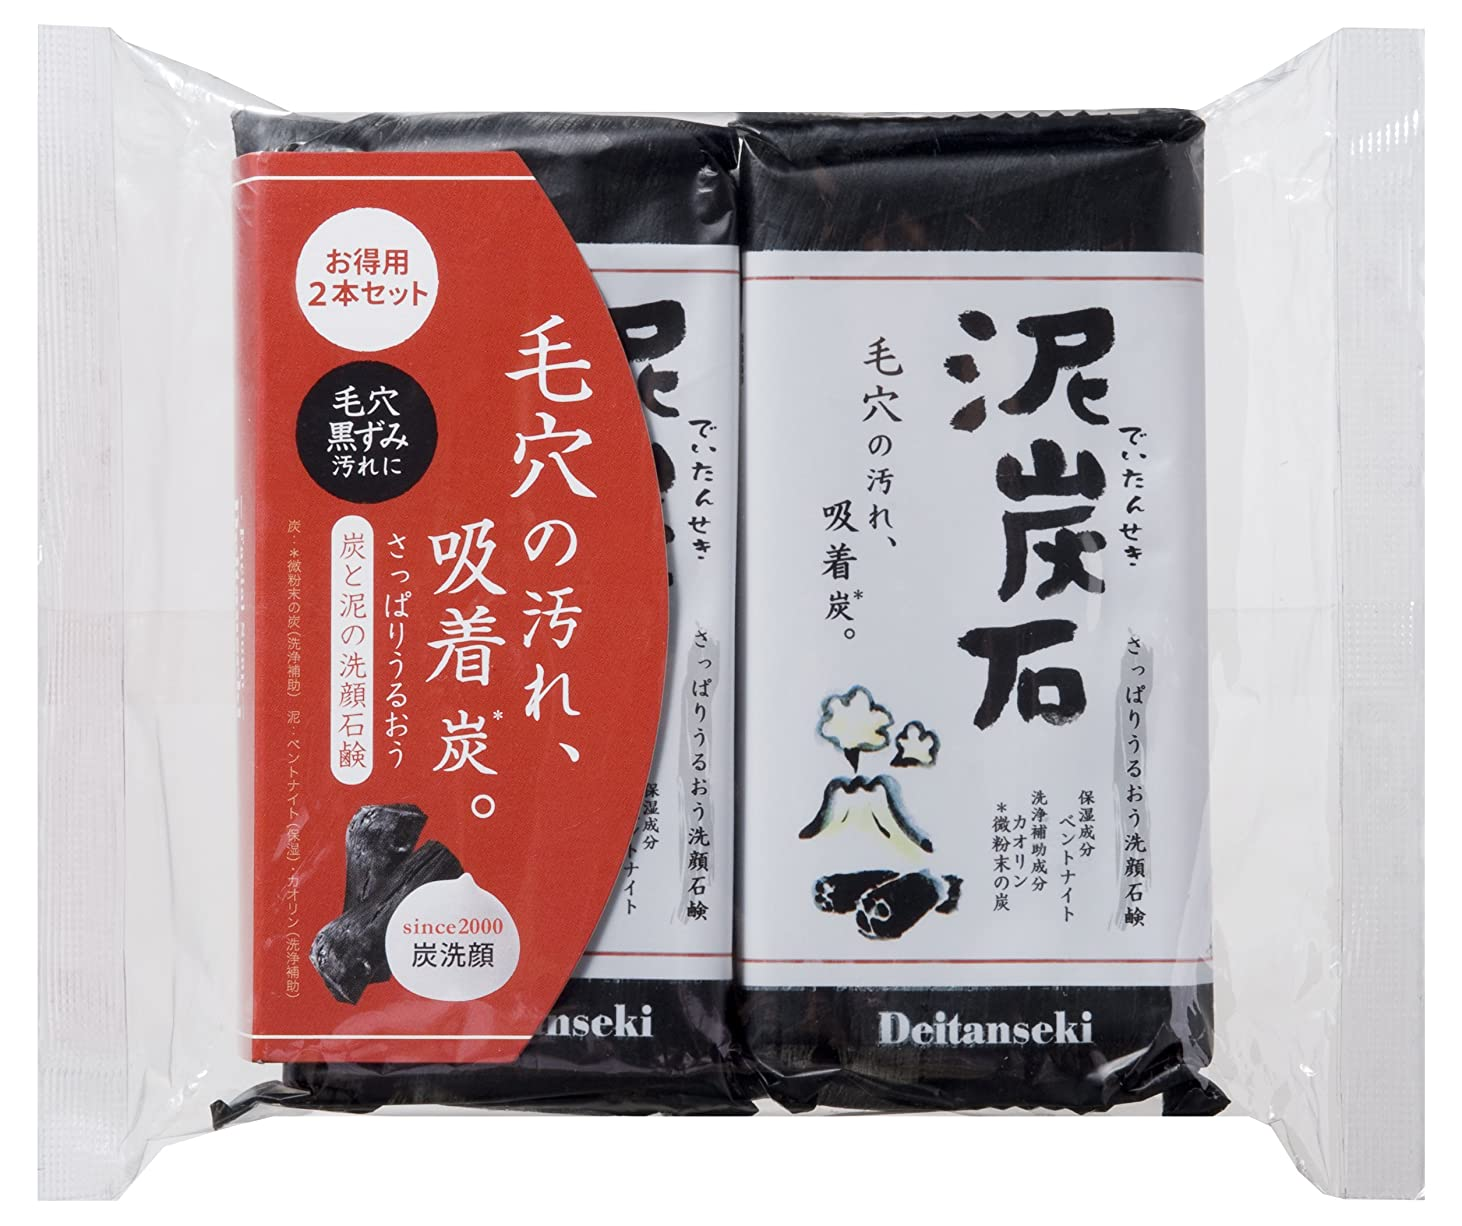 Pelican Deitanseki Soap Clay & Charcoal Facial Cleansing Bar Facial Soaps 2 Bar Set rerii898551